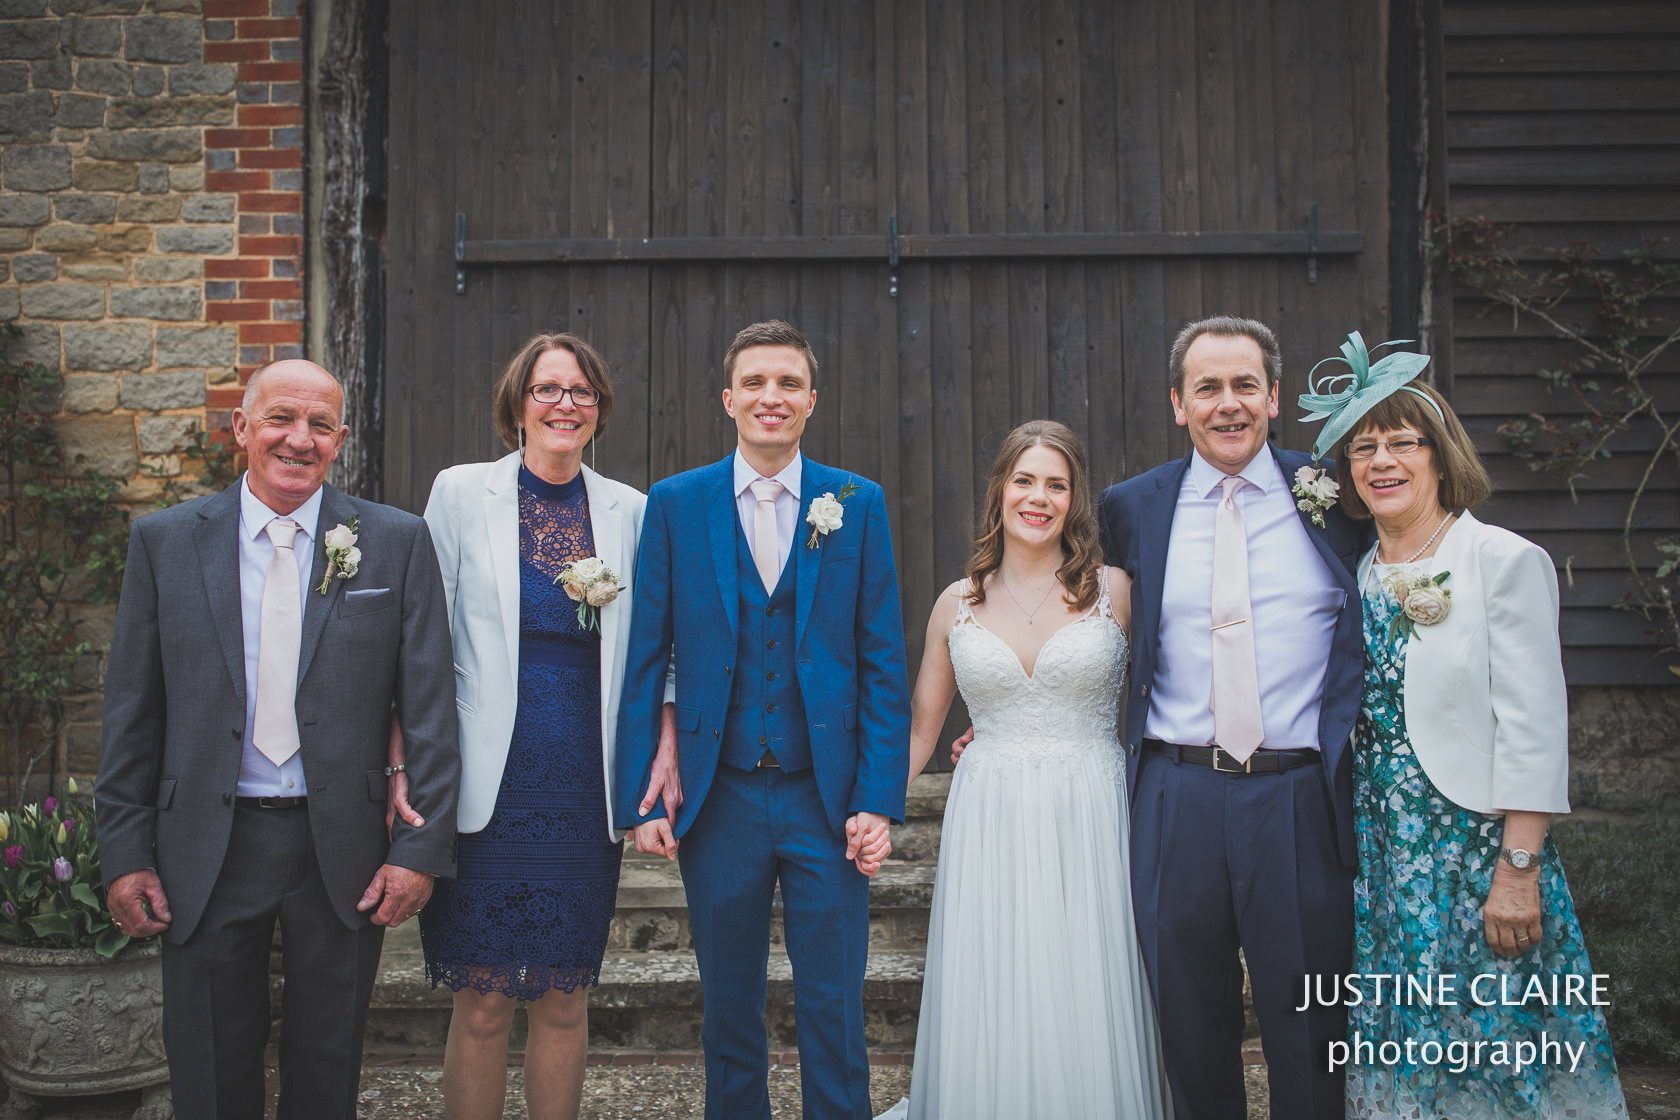 Fitzleroi Fittleworth petworth Billingshurst farm Wedding Photography by Justine Claire photographer Arundel Worthing Brighton-28.jpg